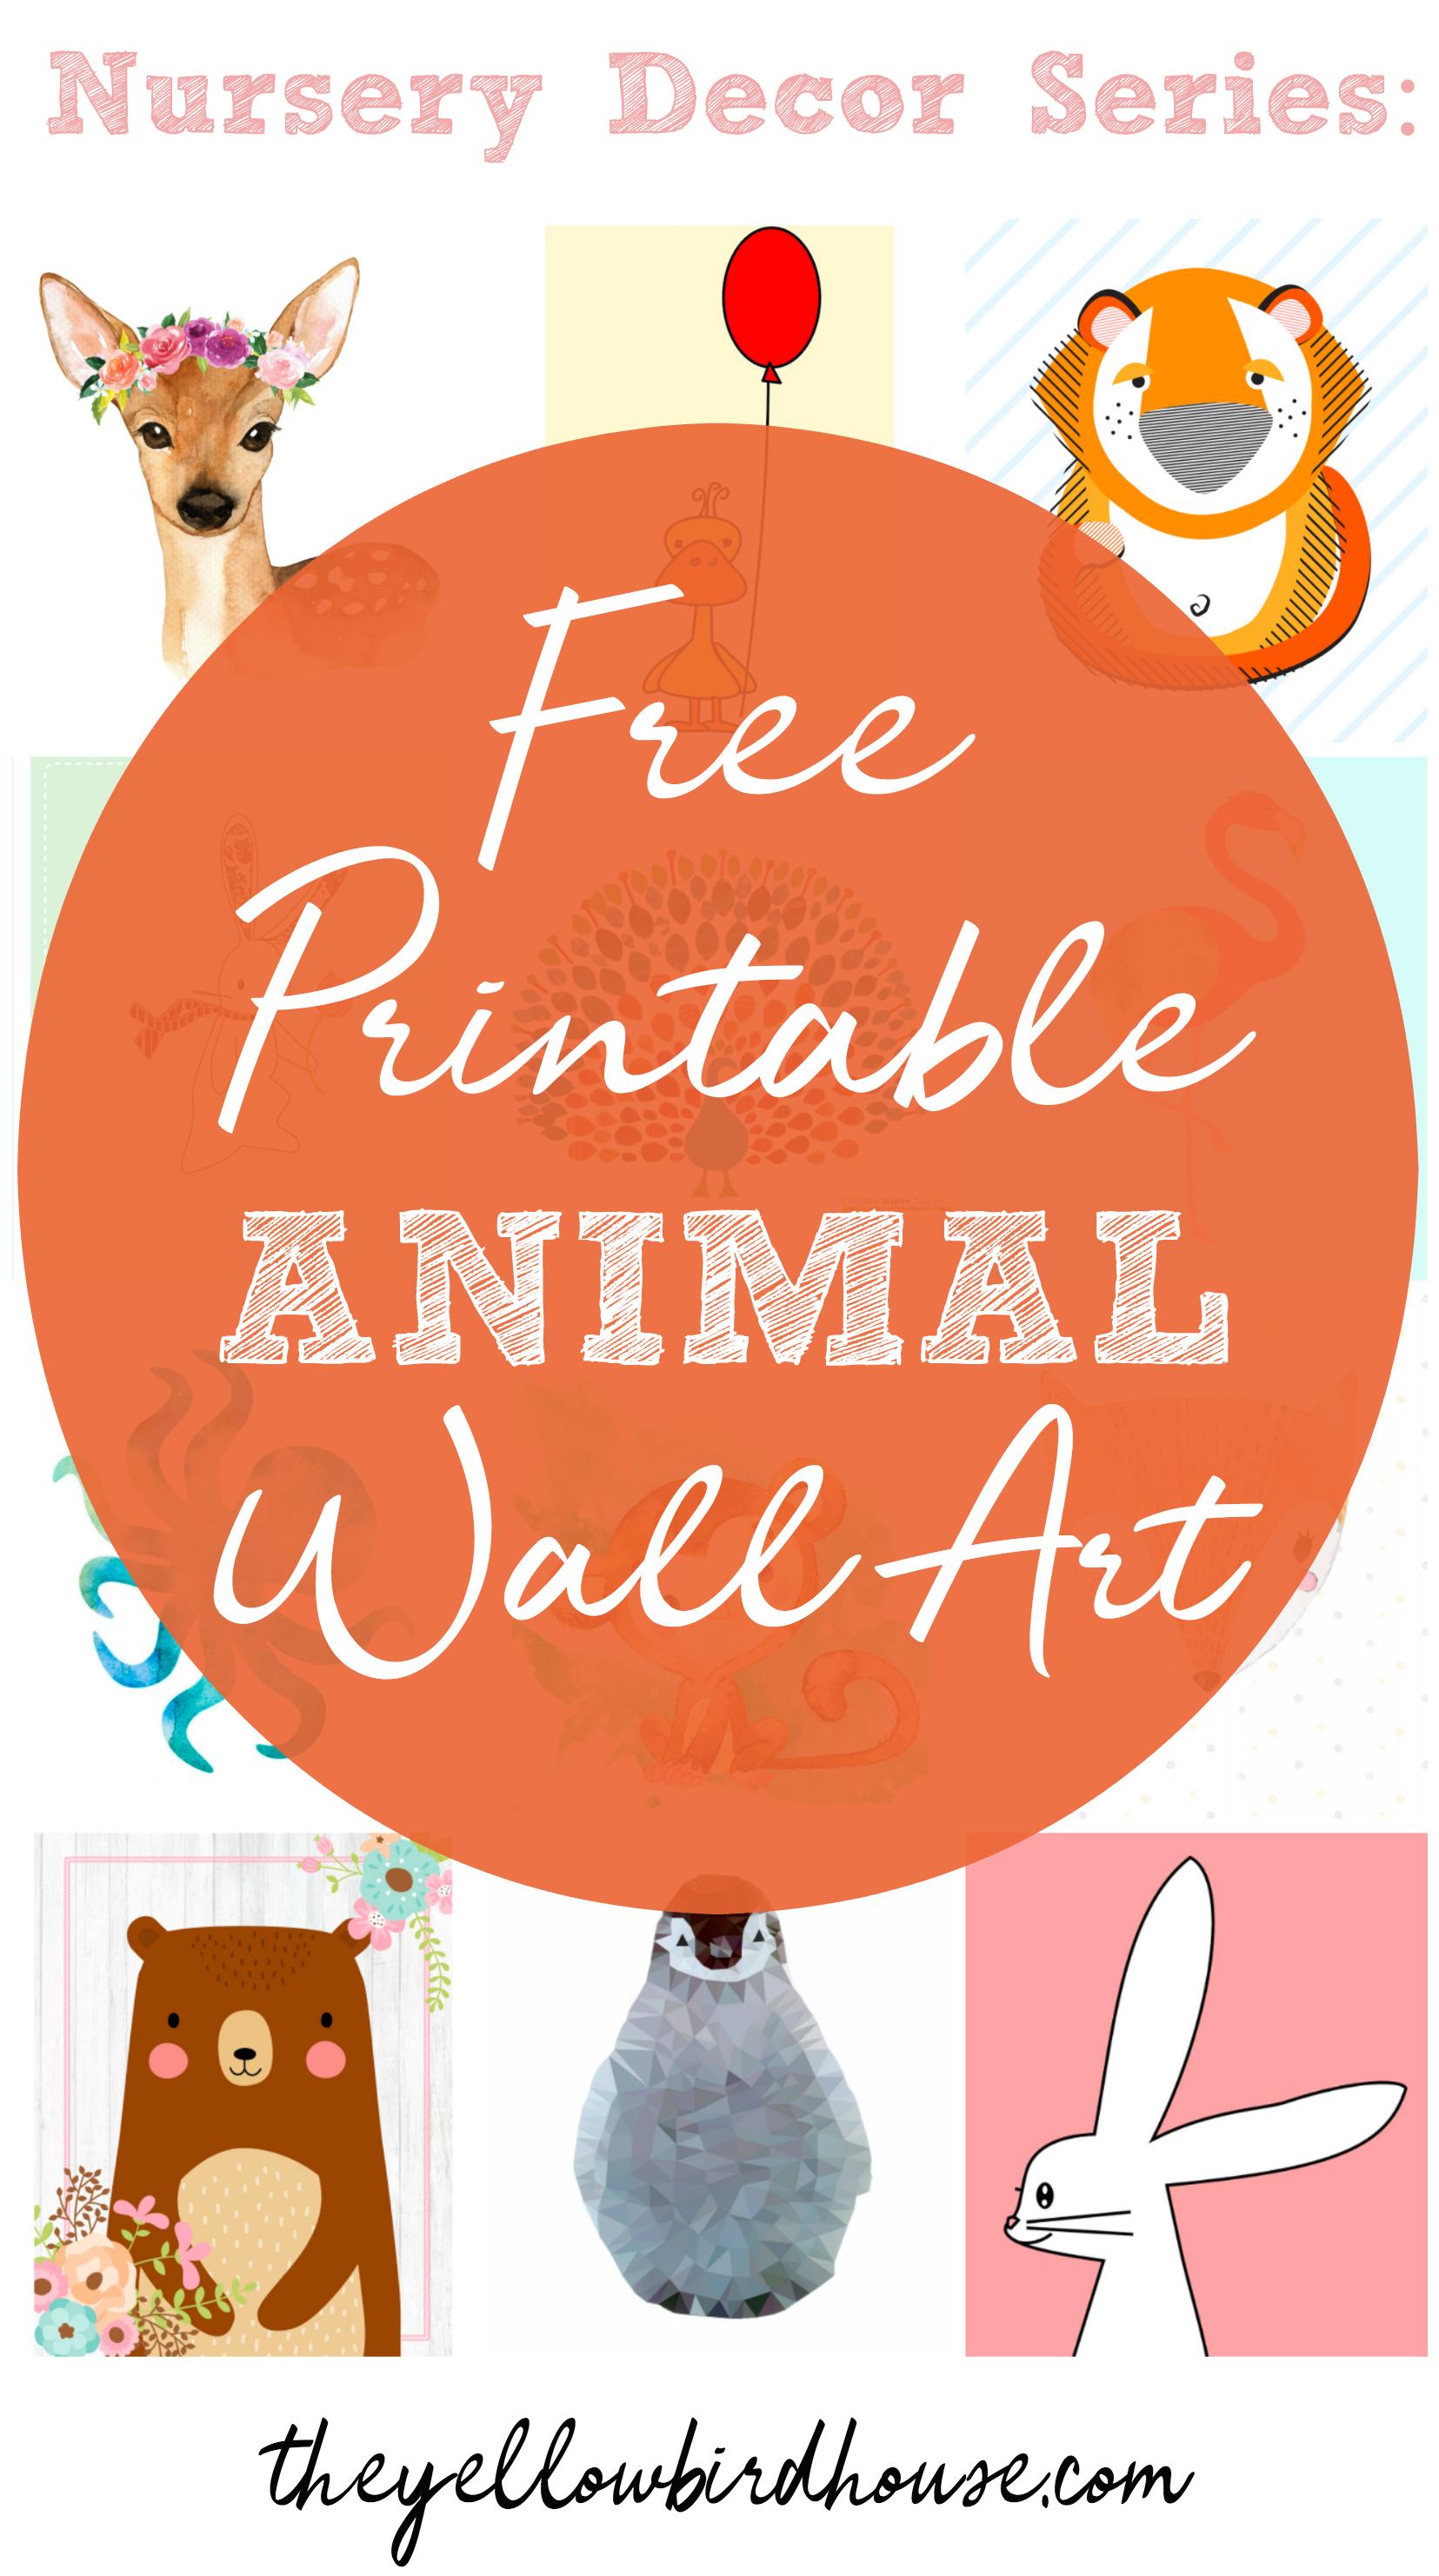 Nursery Decor Series 57 Free Printable Animal Wall Art Pieces Free Printable Wall Art Printable Nursery Art Art Wall Kids